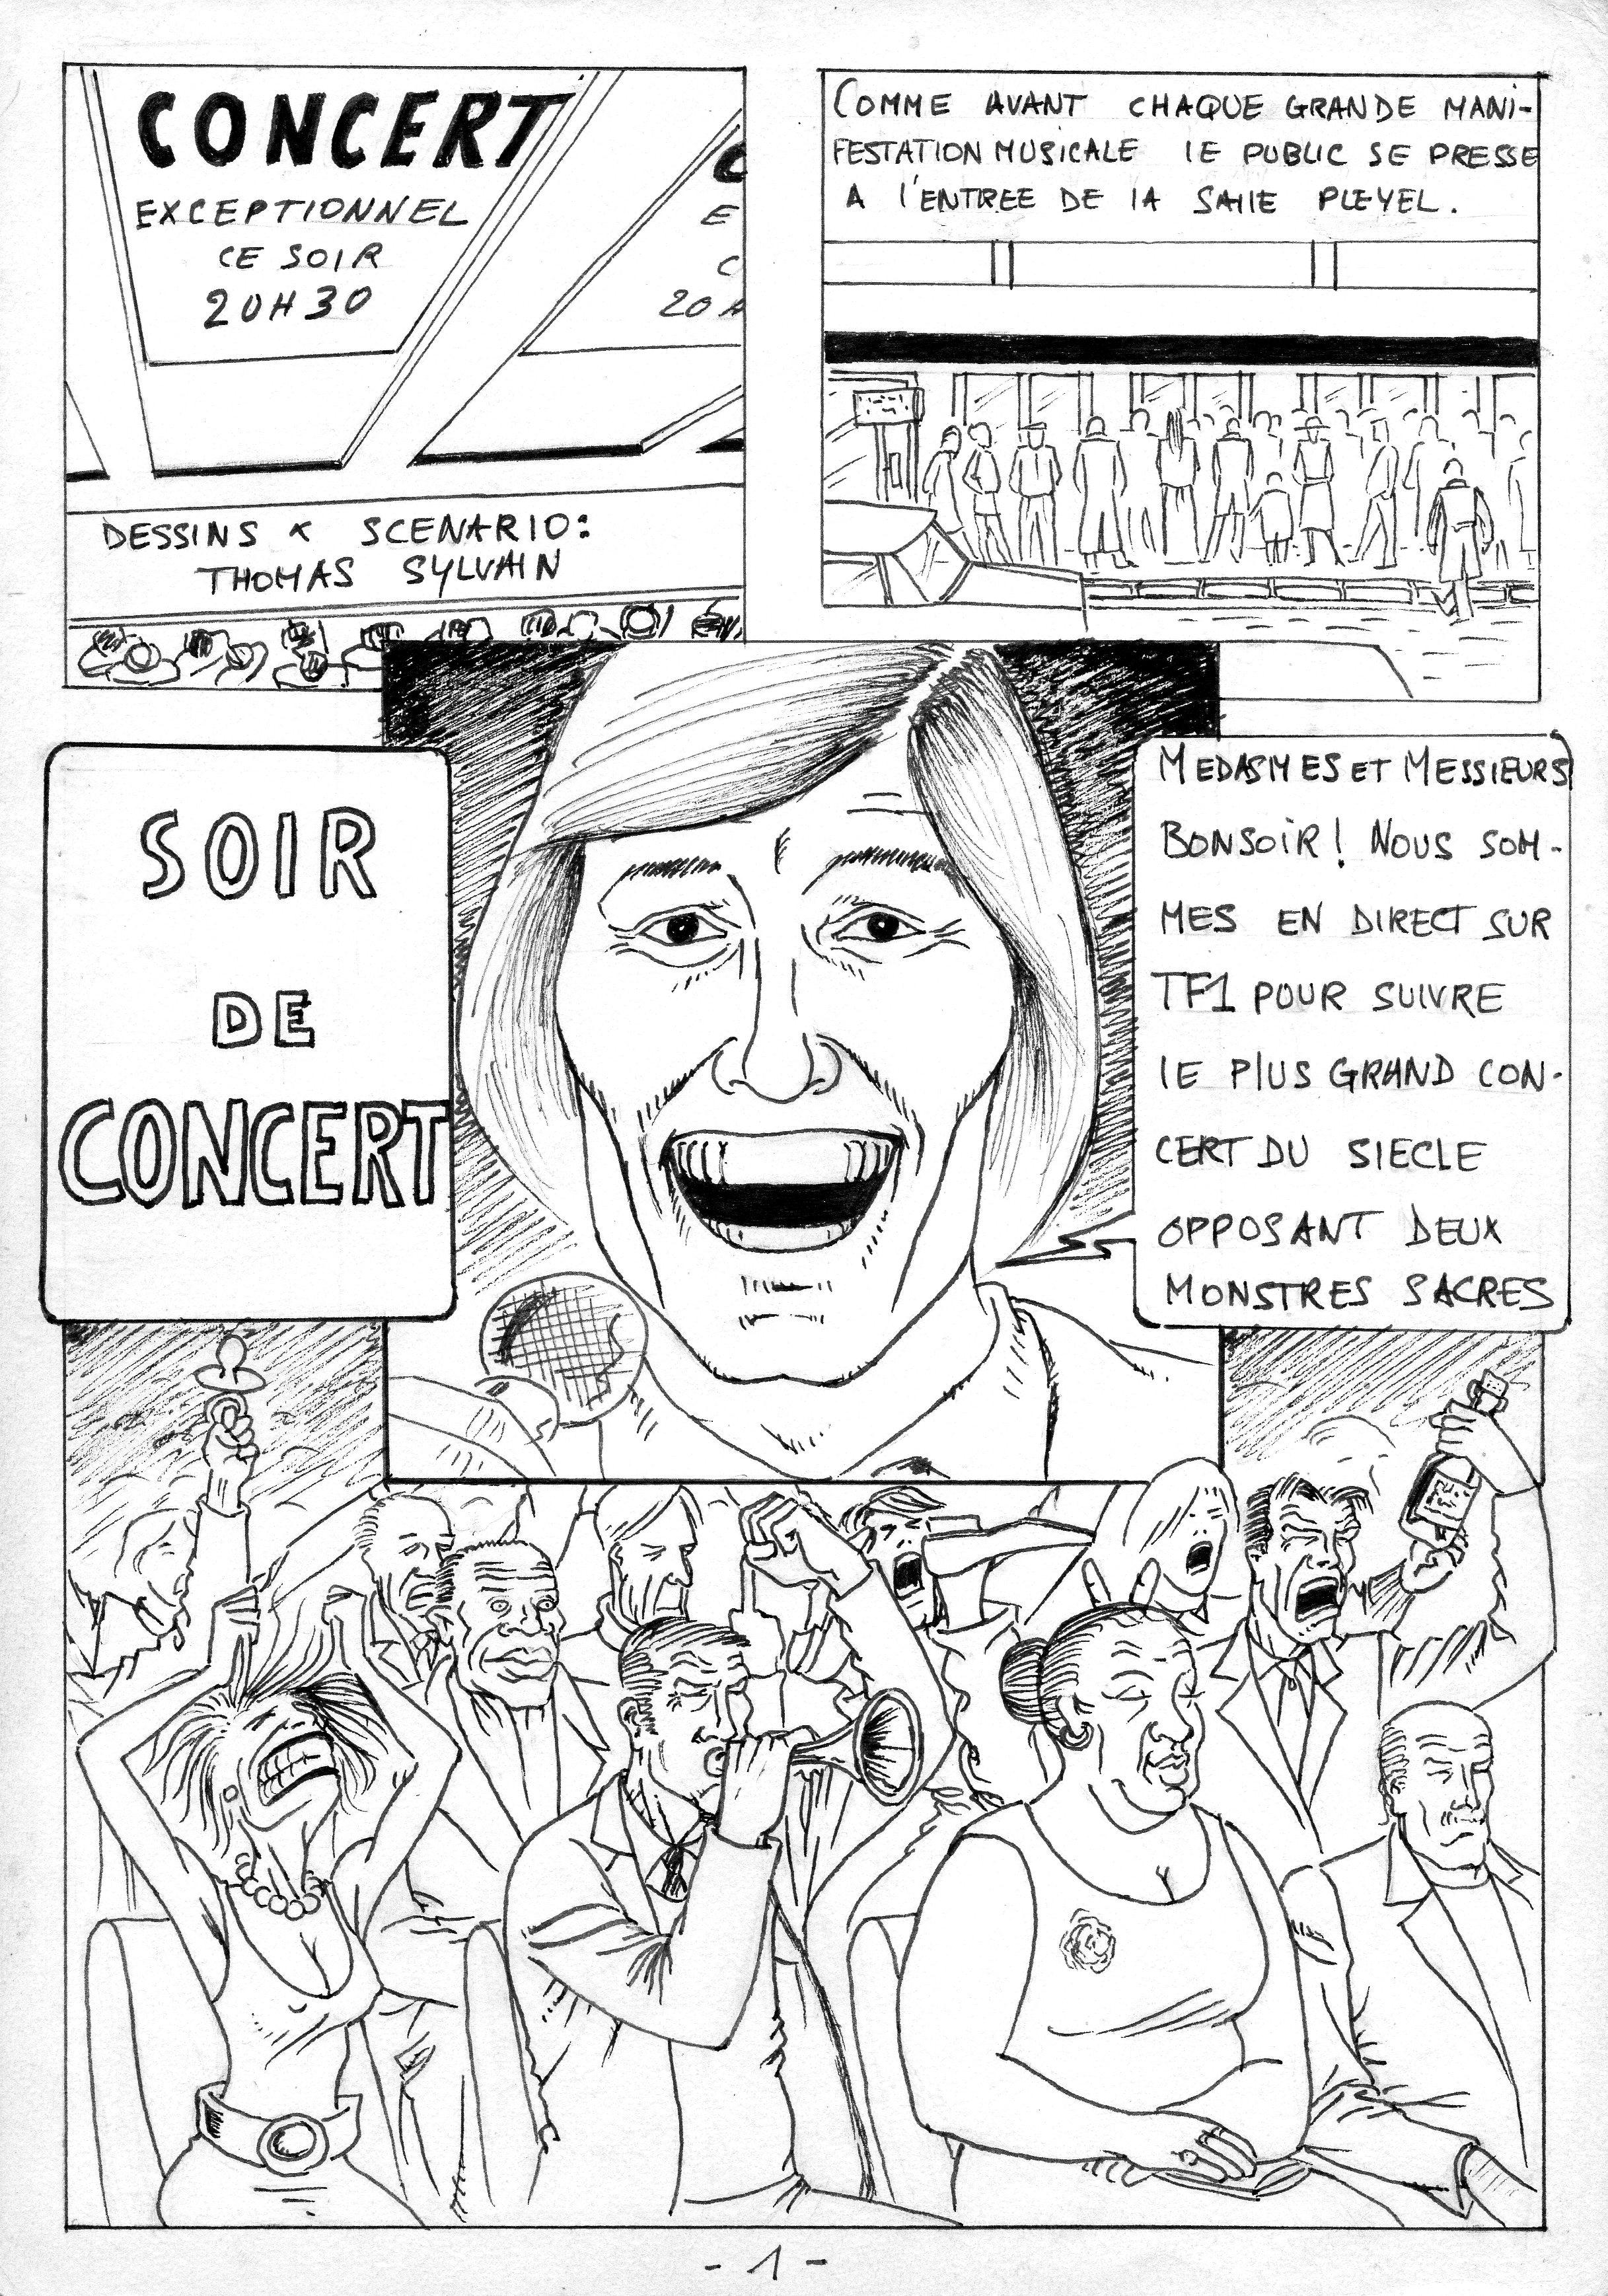 Soir de concert006